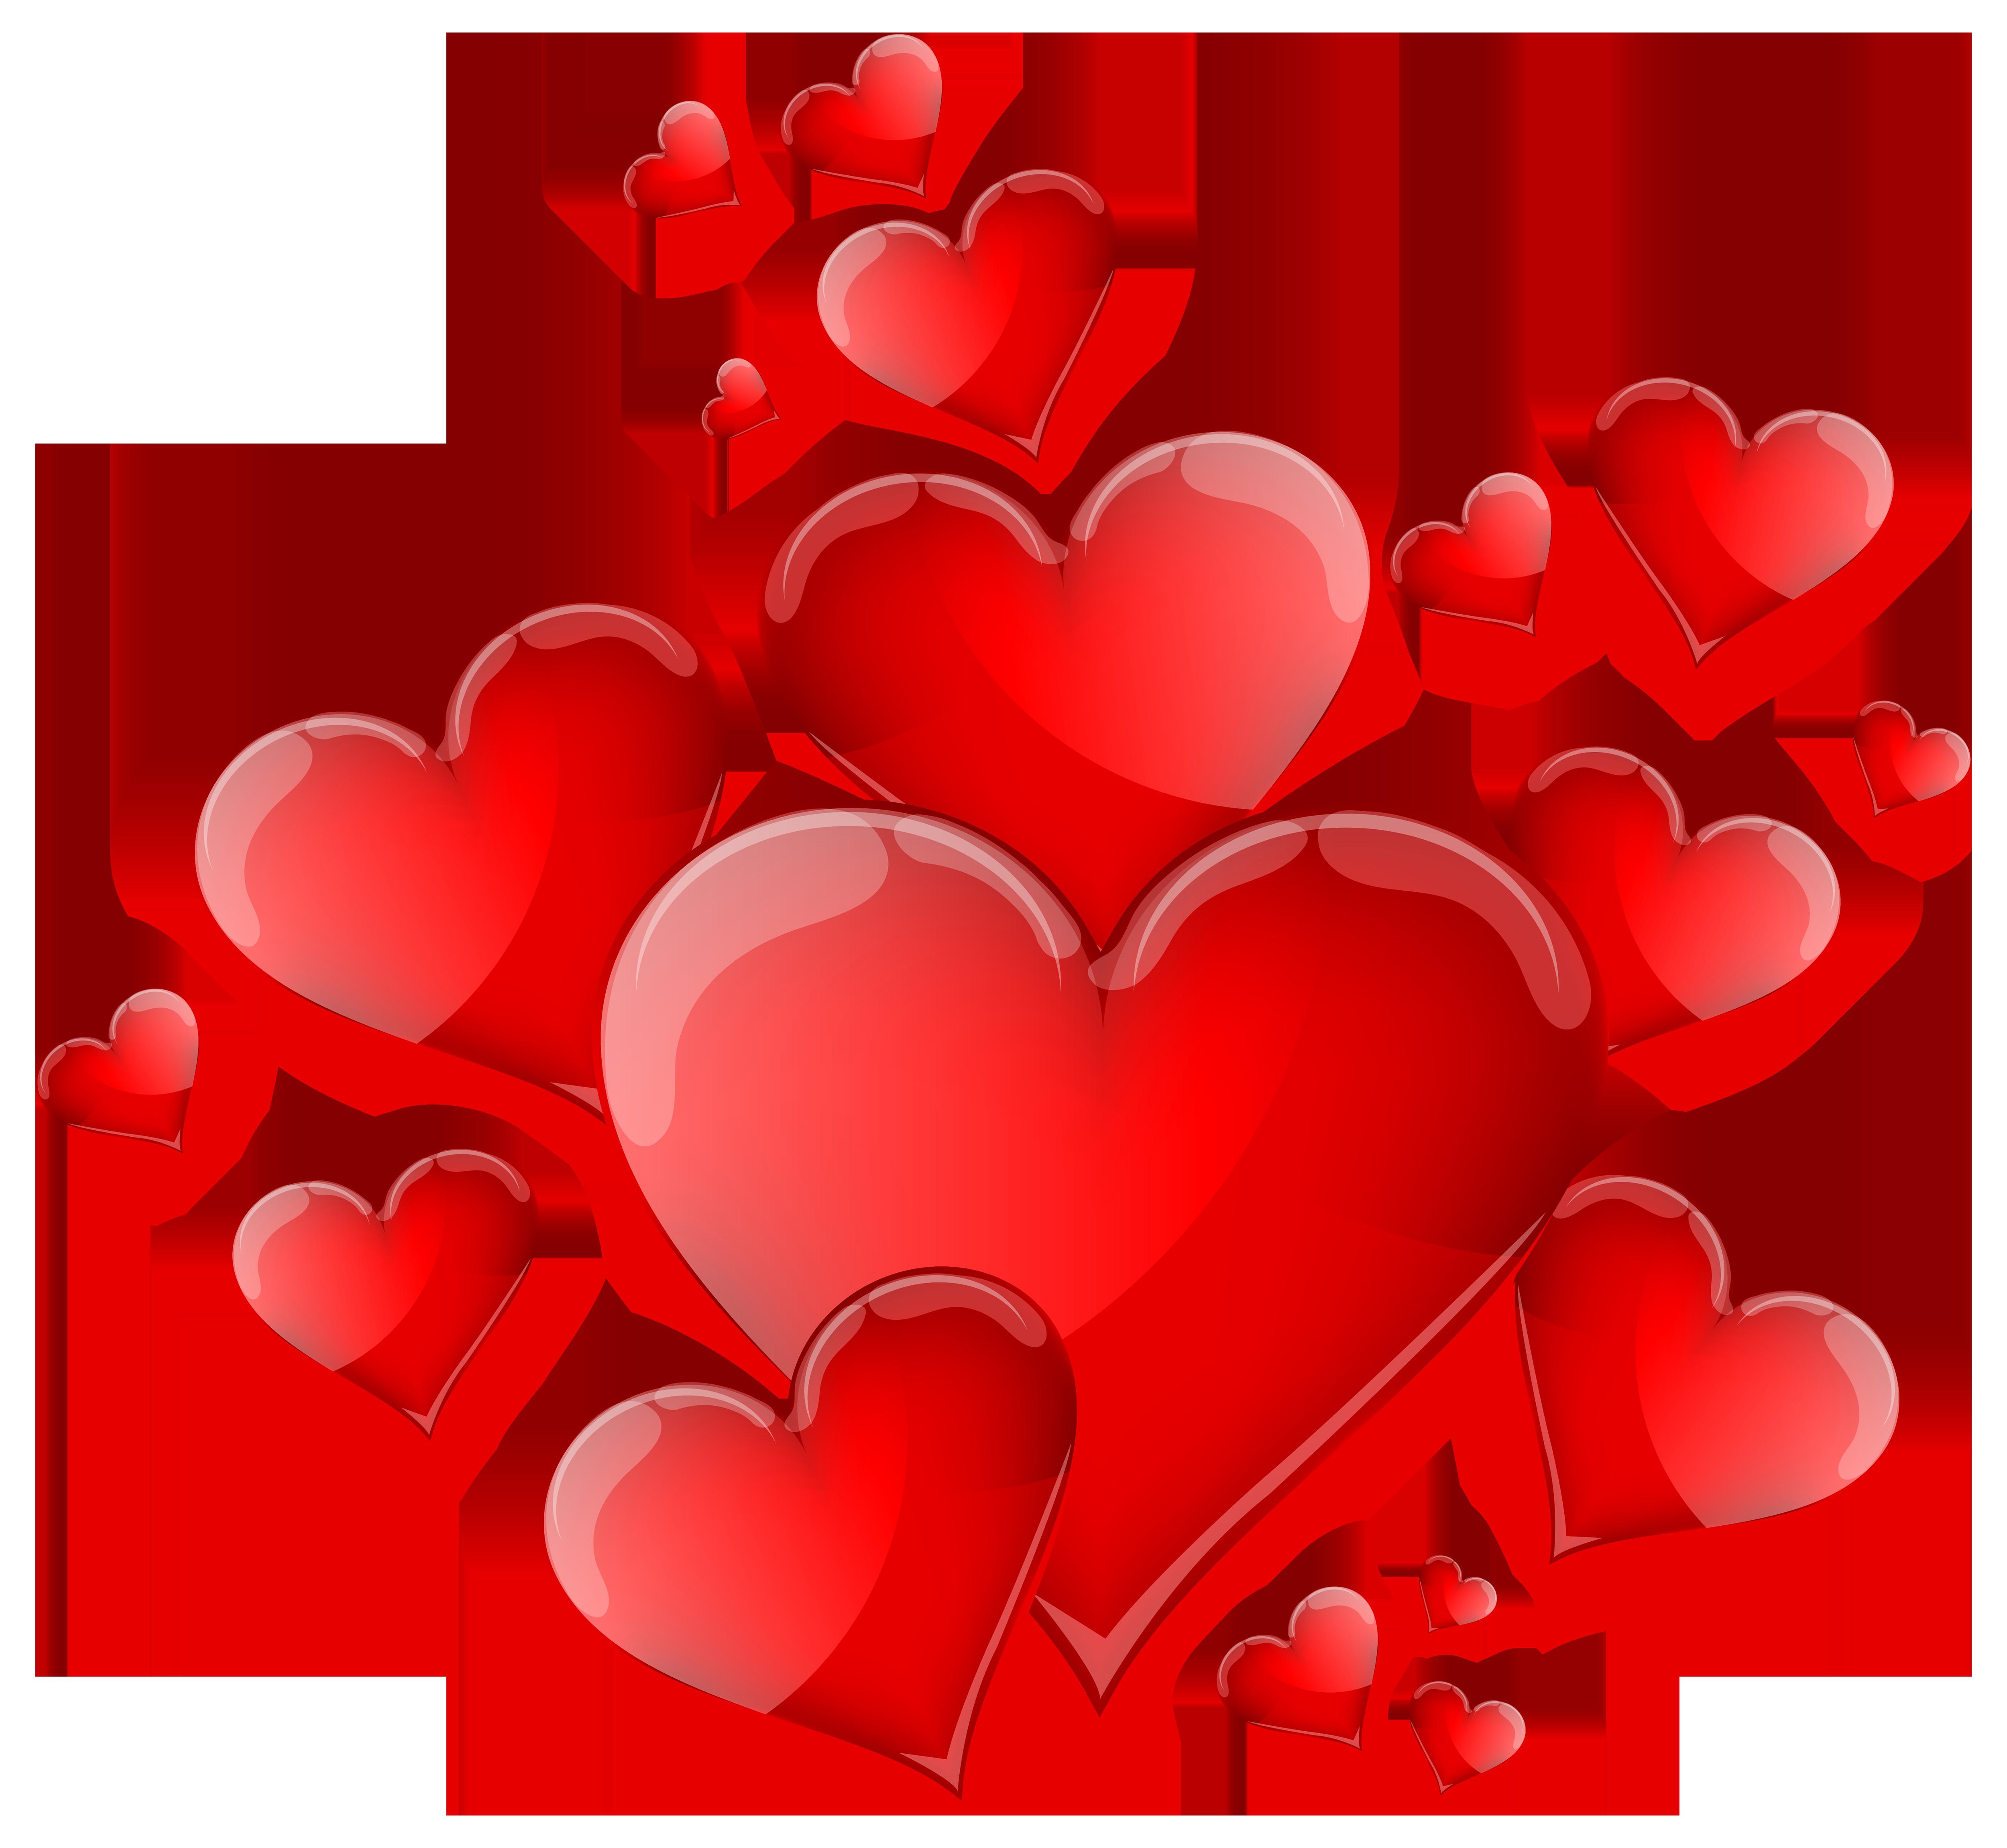 Hearts PNG PNG Clipart WEB